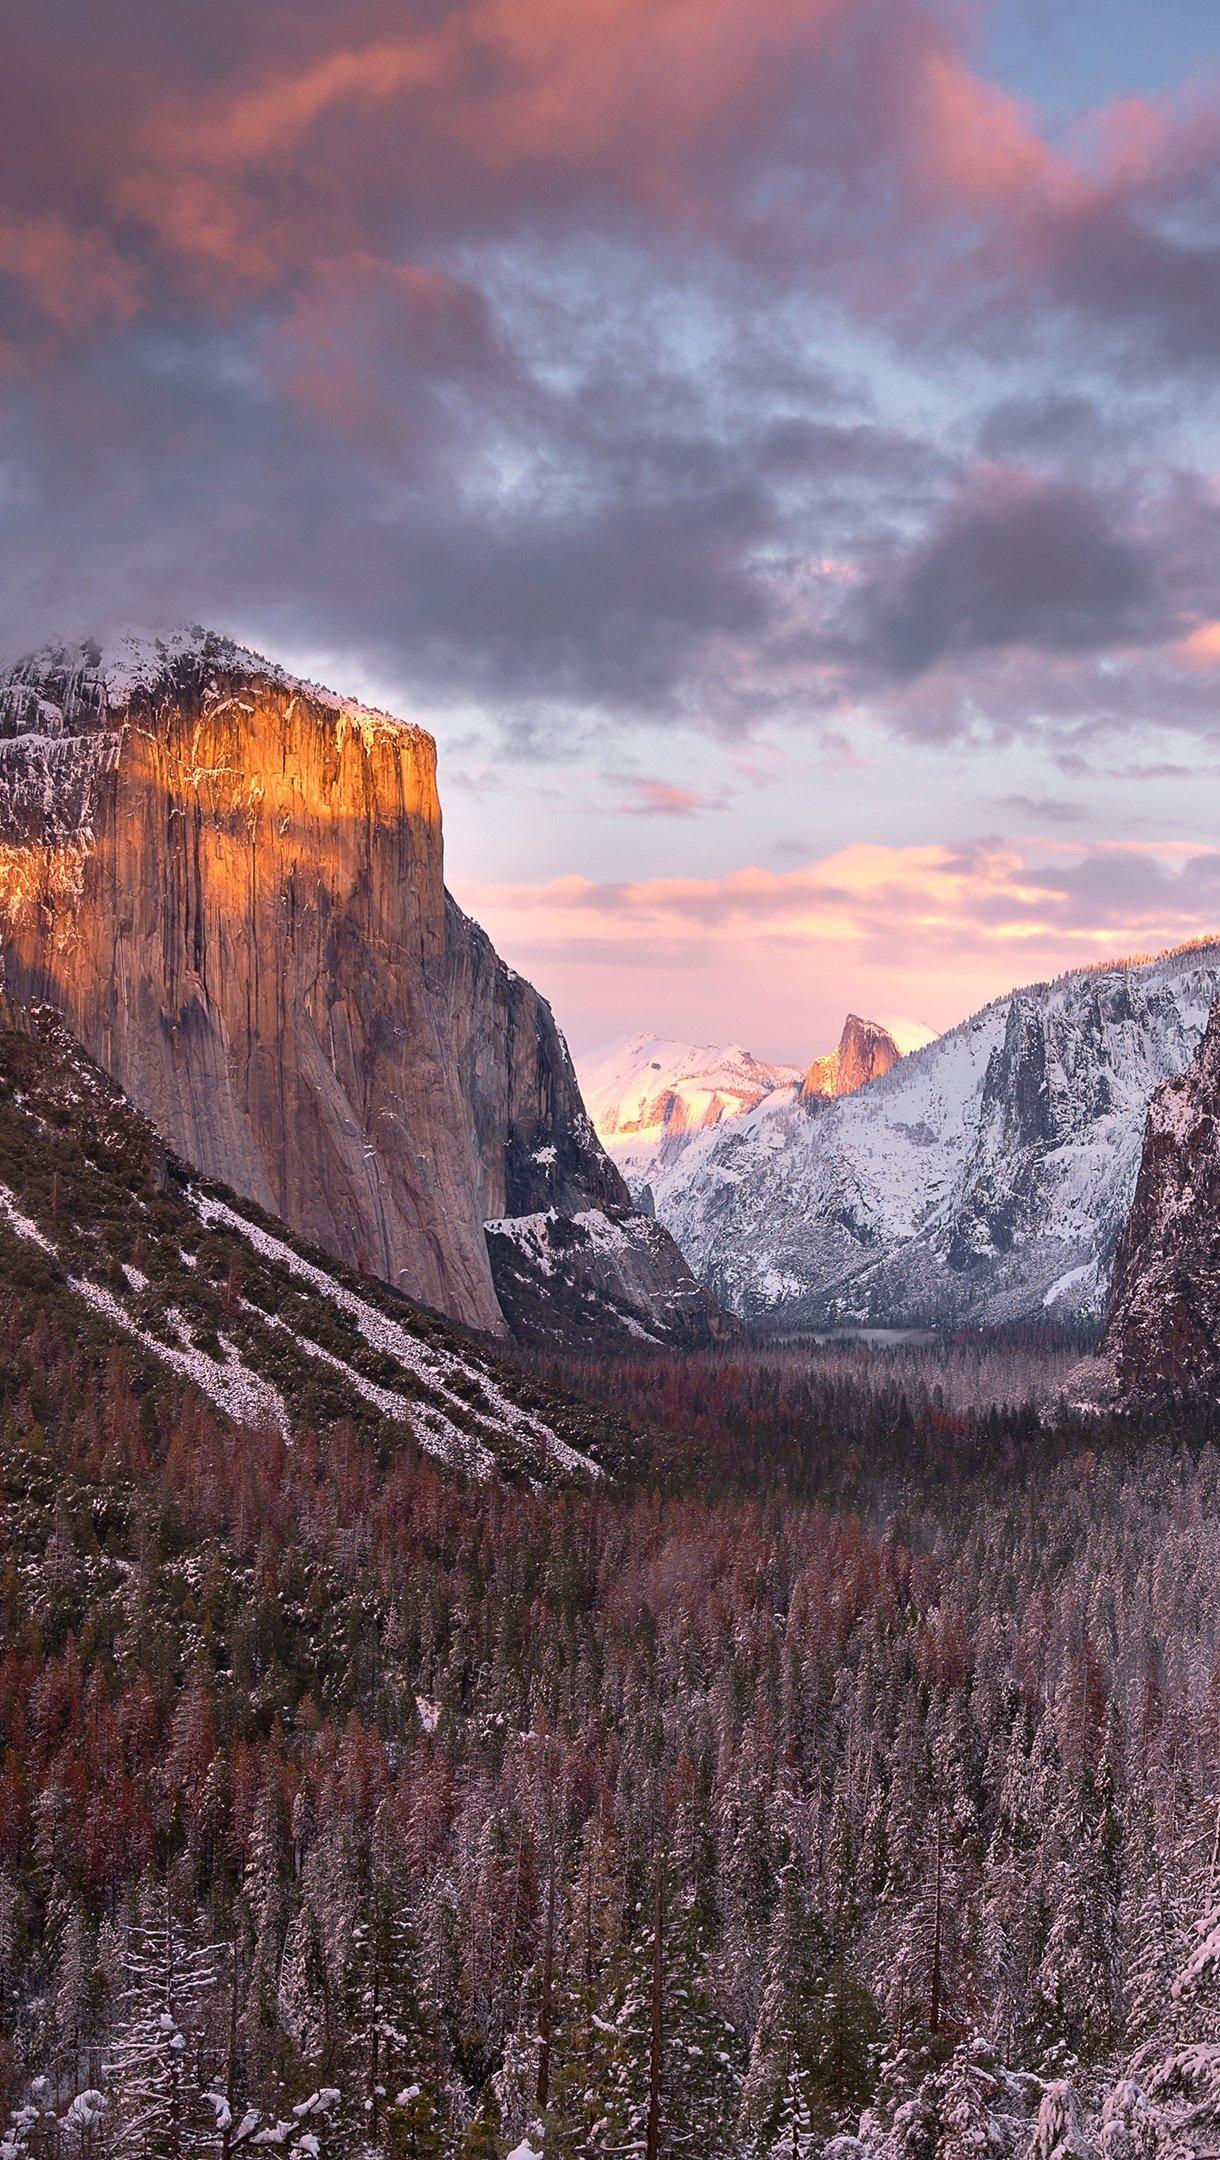 Fondos de pantalla Yosemite al atardecer Vertical